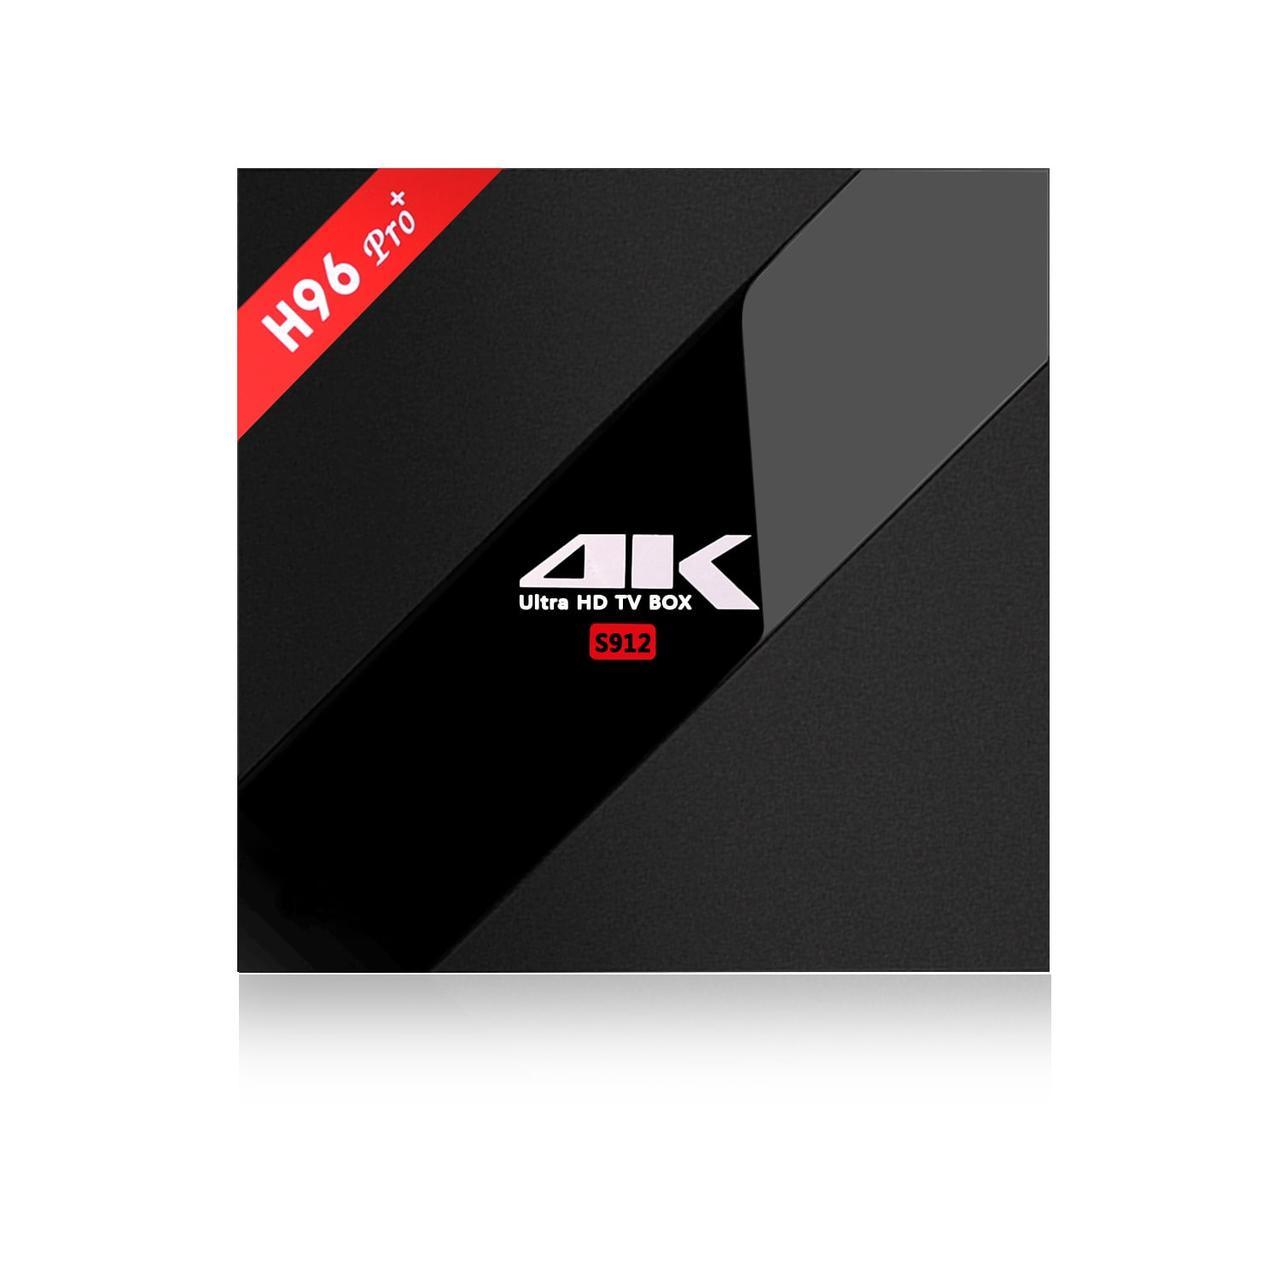 Смарт ТВ приставка H96 Pro Plus 3Gb + 32Gb